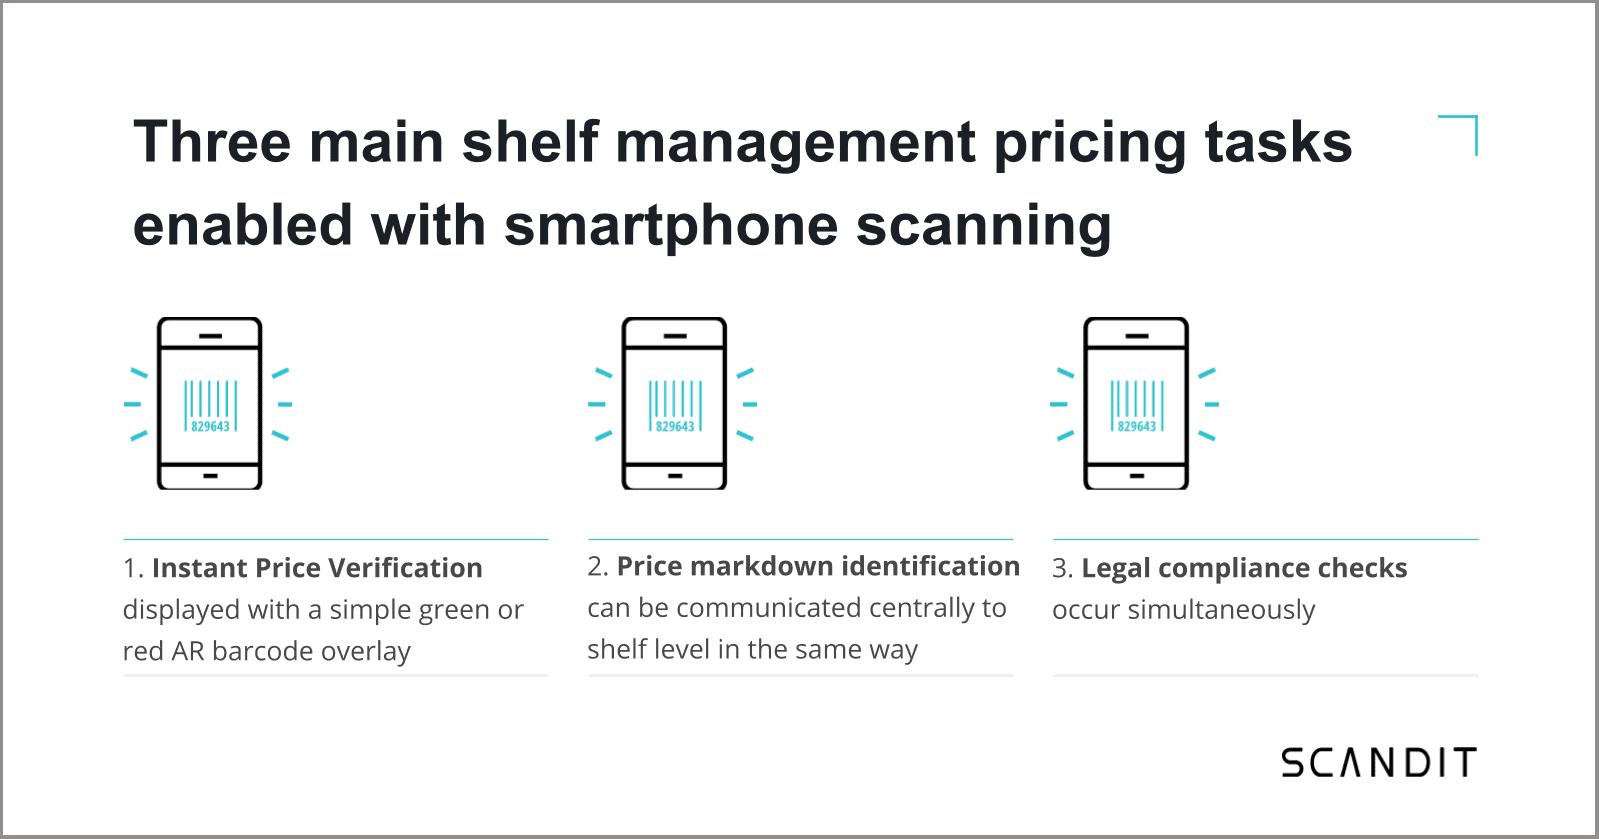 3 main shelf management pricing tasks enabled with smartphone scanning